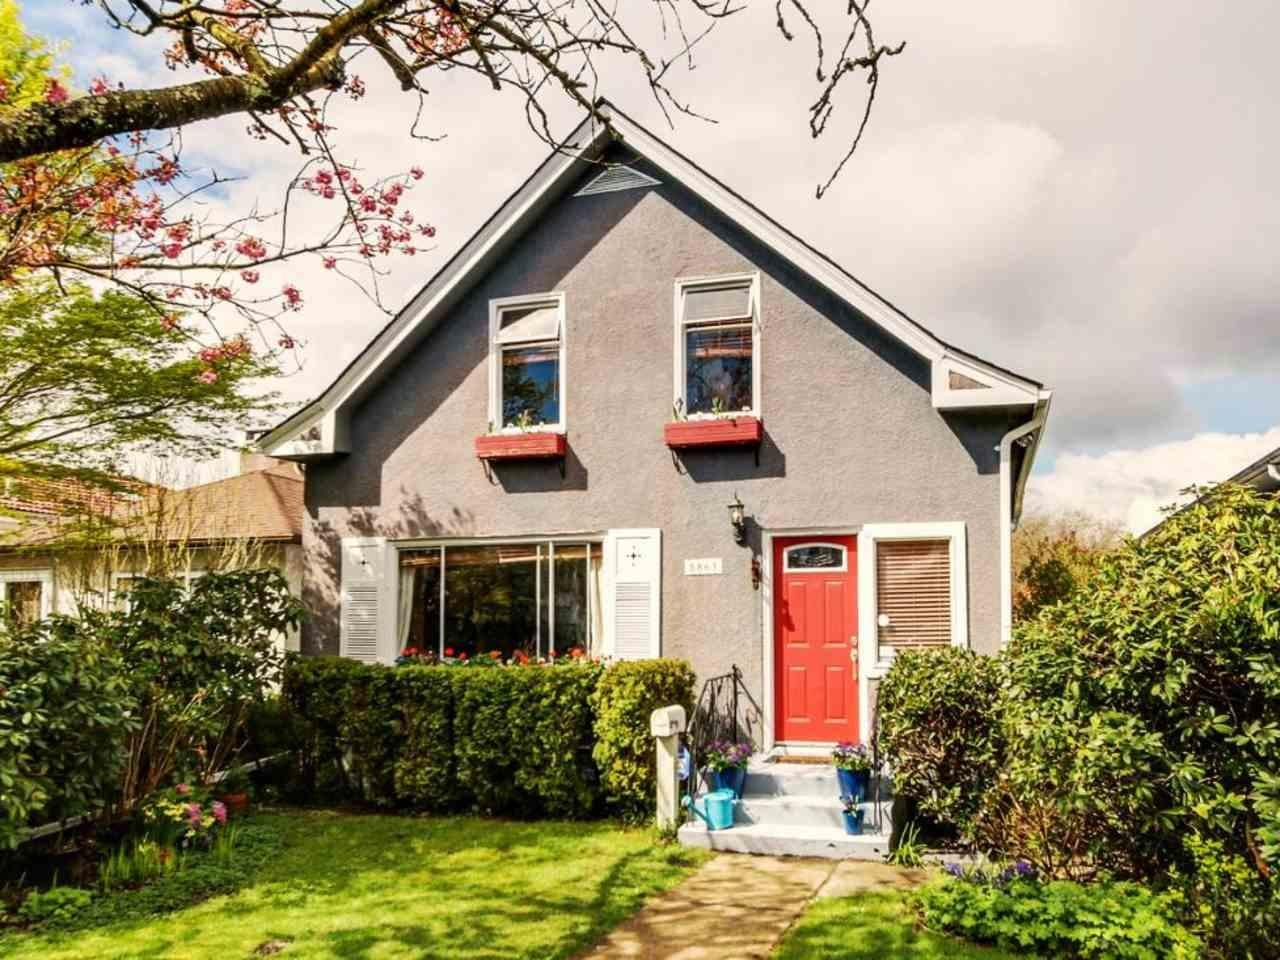 R2158644 - 5861 CREE STREET, Main, Vancouver, BC - House/Single Family